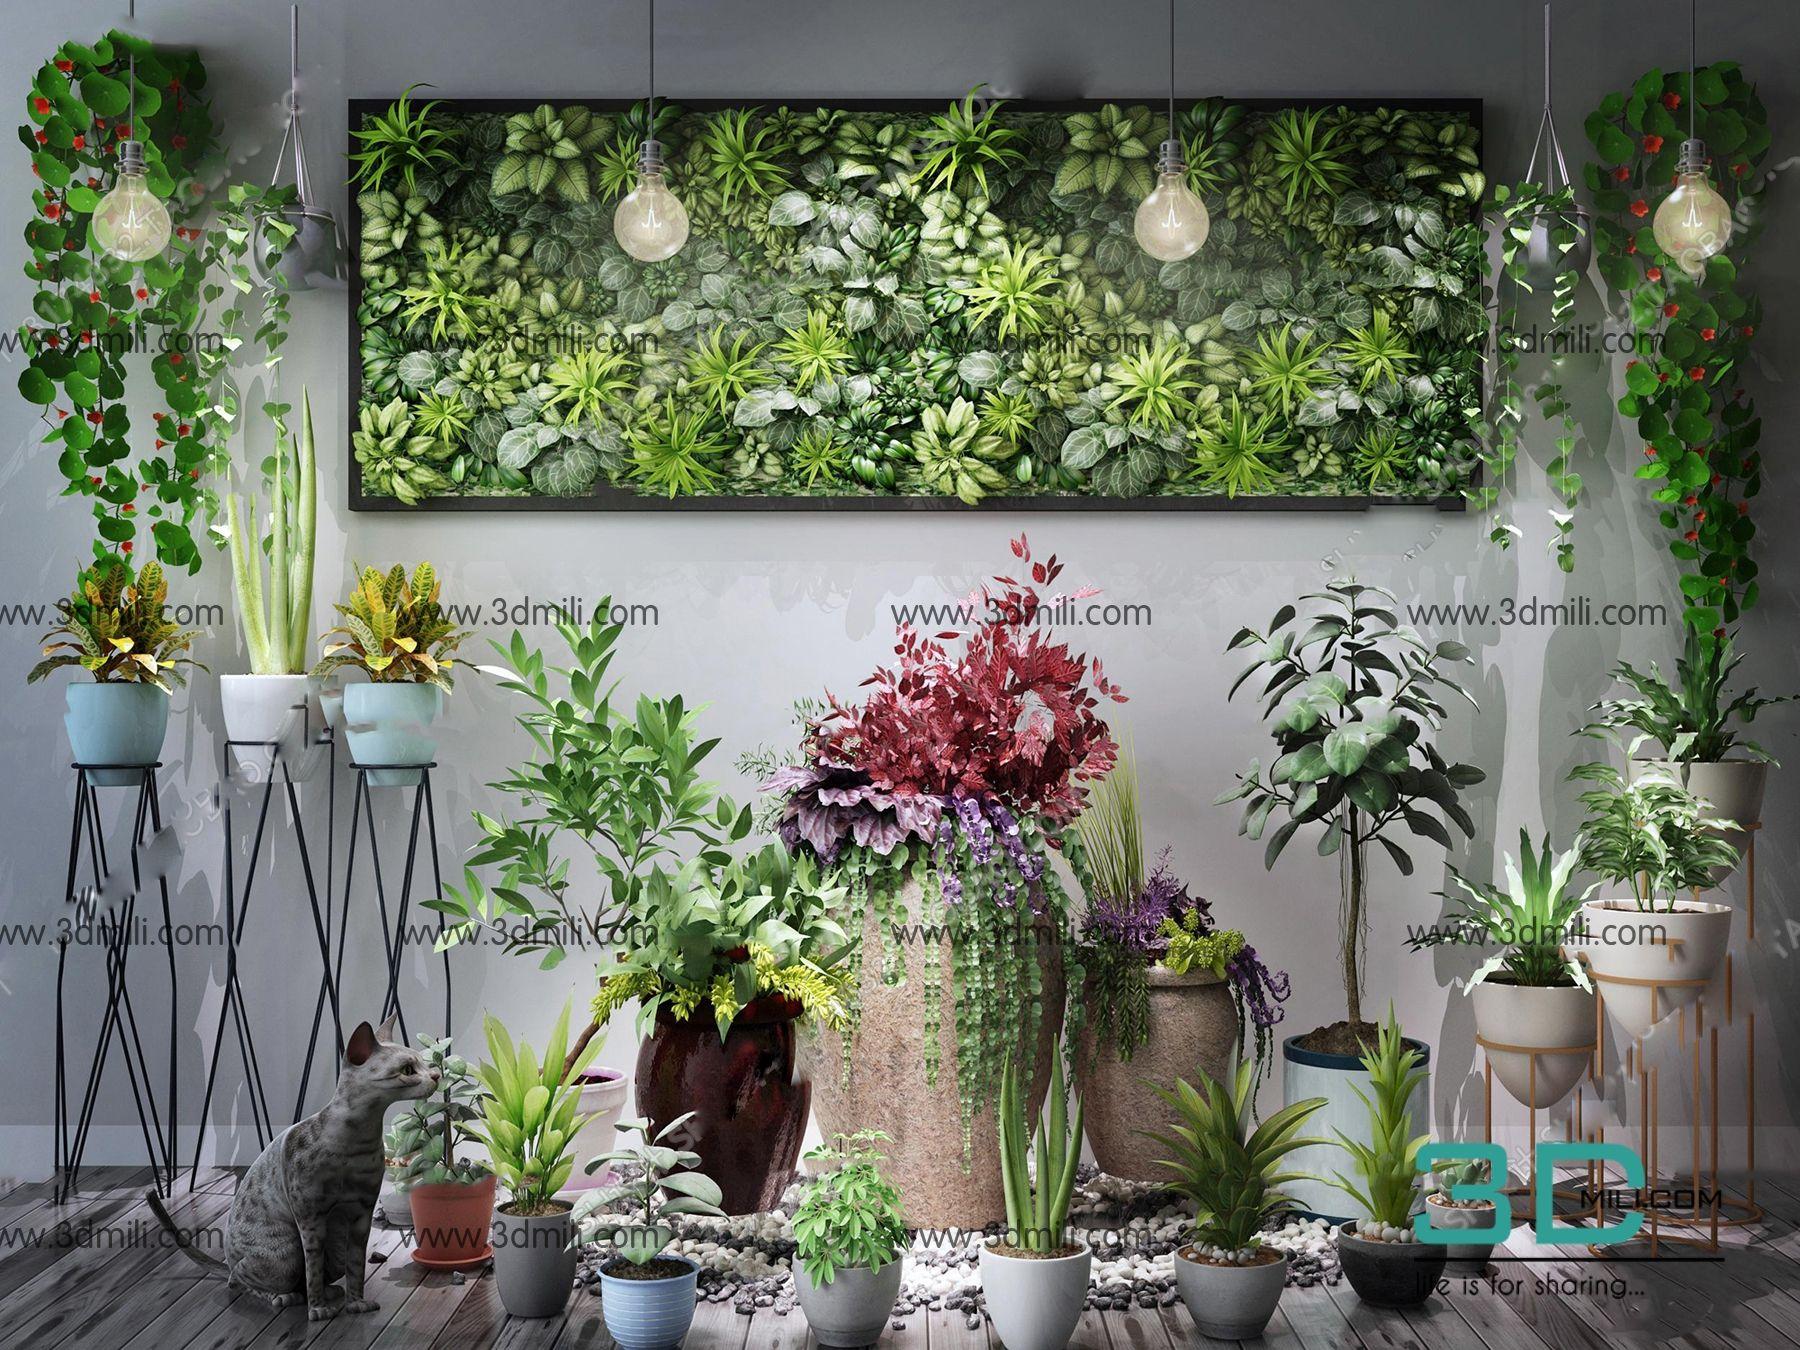 346  Plant 3dsmax Model Free Download - 3D Mili - Download